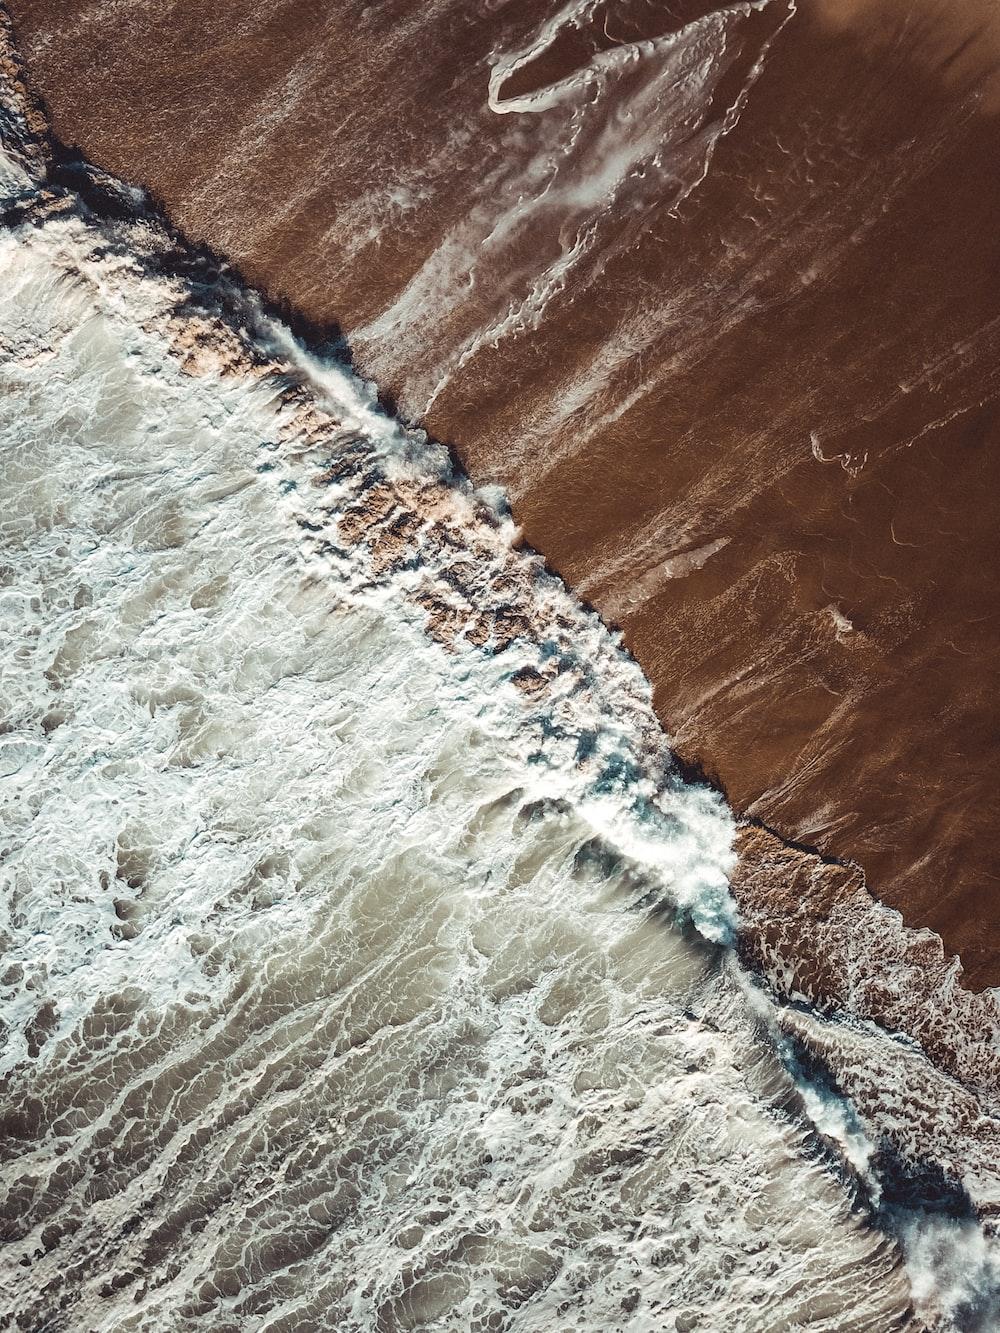 birds eye view photo of seashore